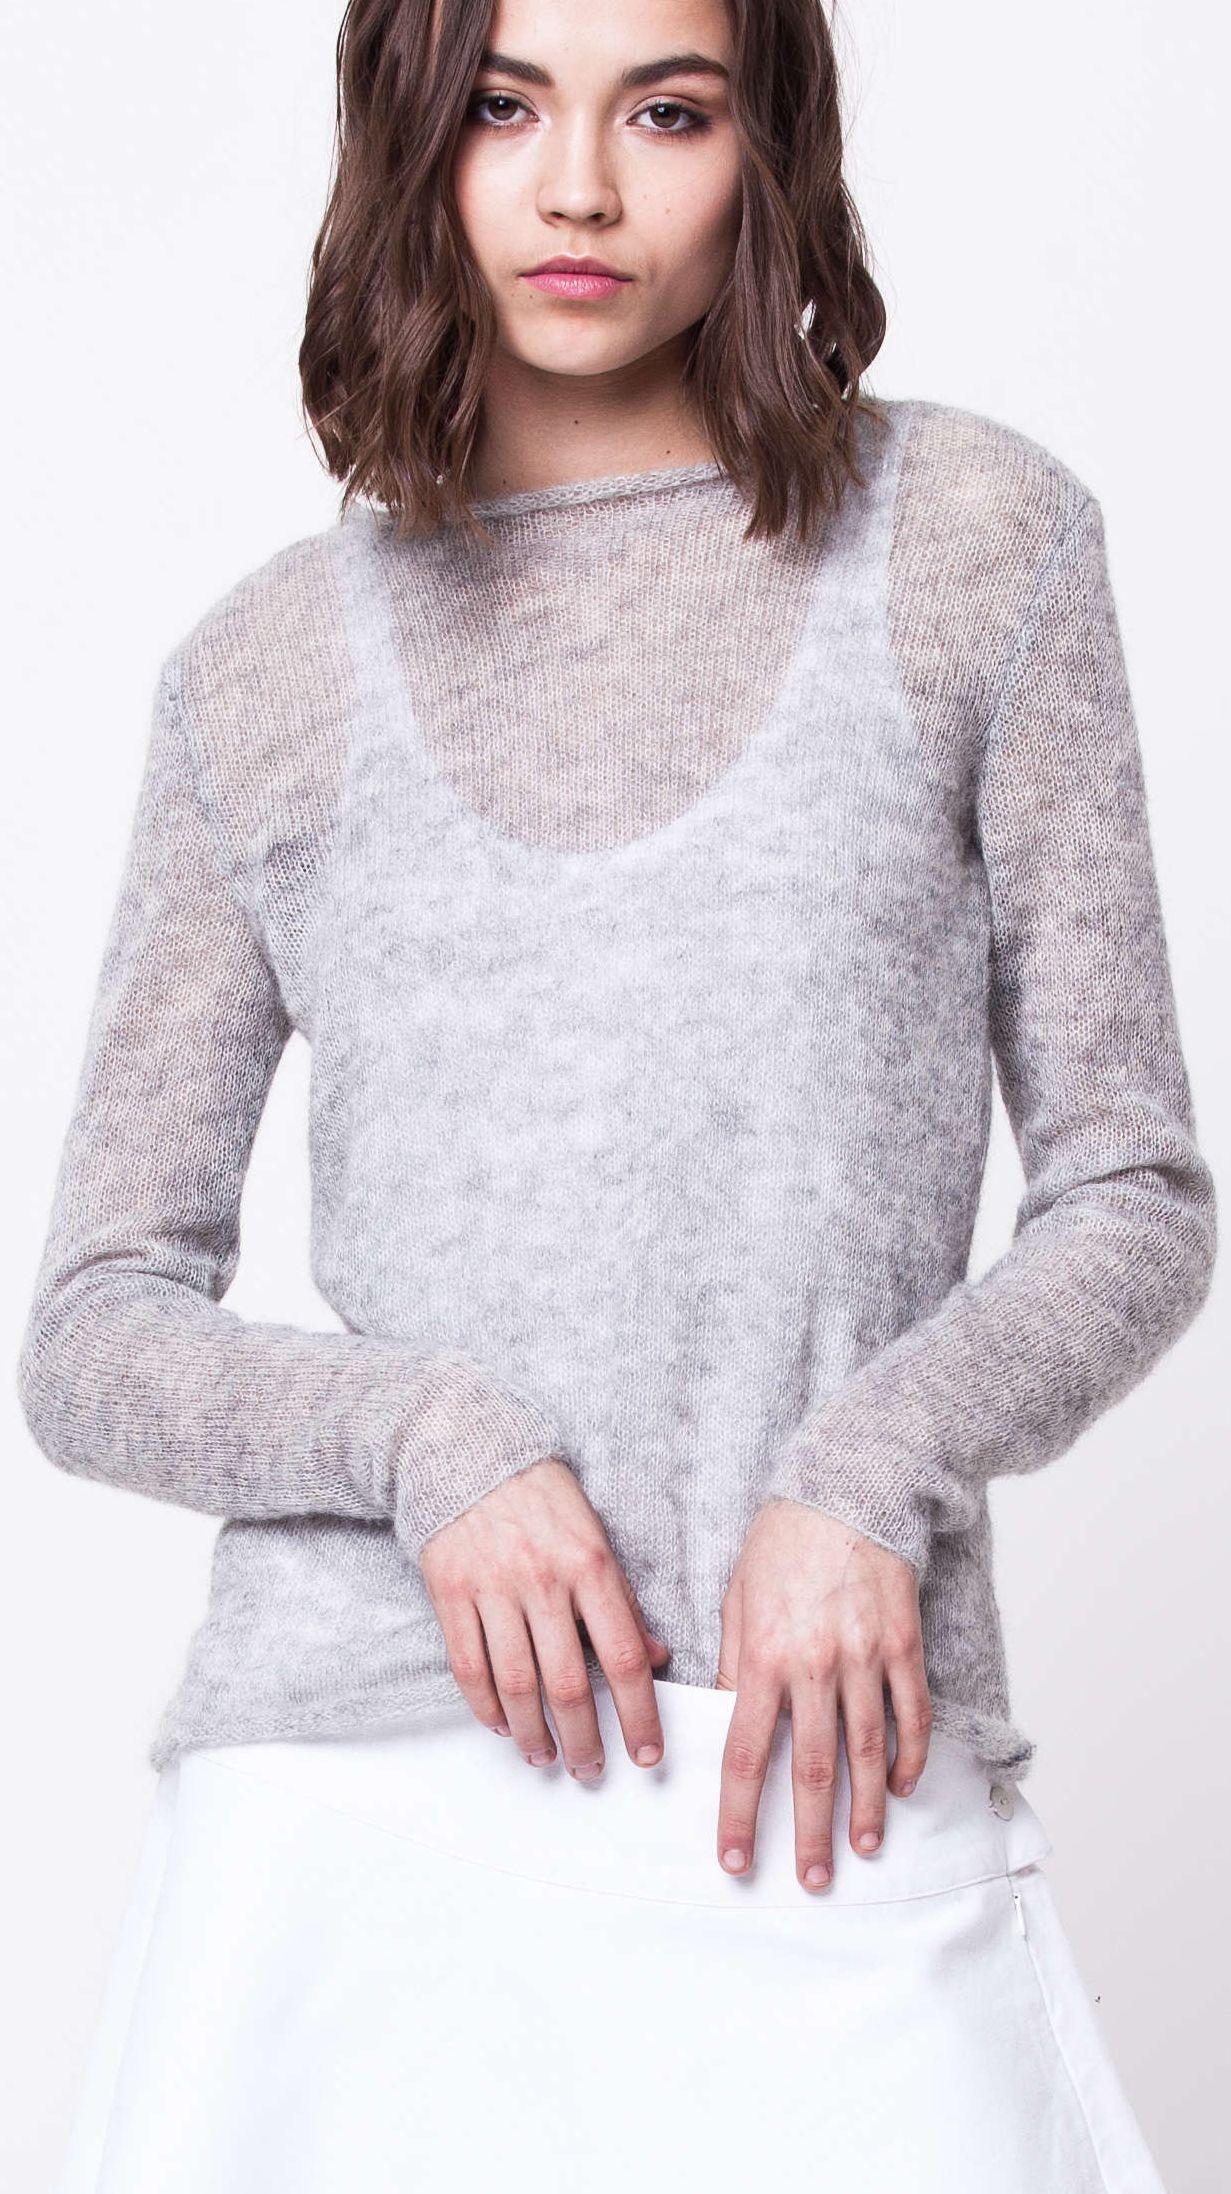 damen pullover grey mohair crew neck sweater jonna krista elsta  grey mohair crew neck sweater jonna